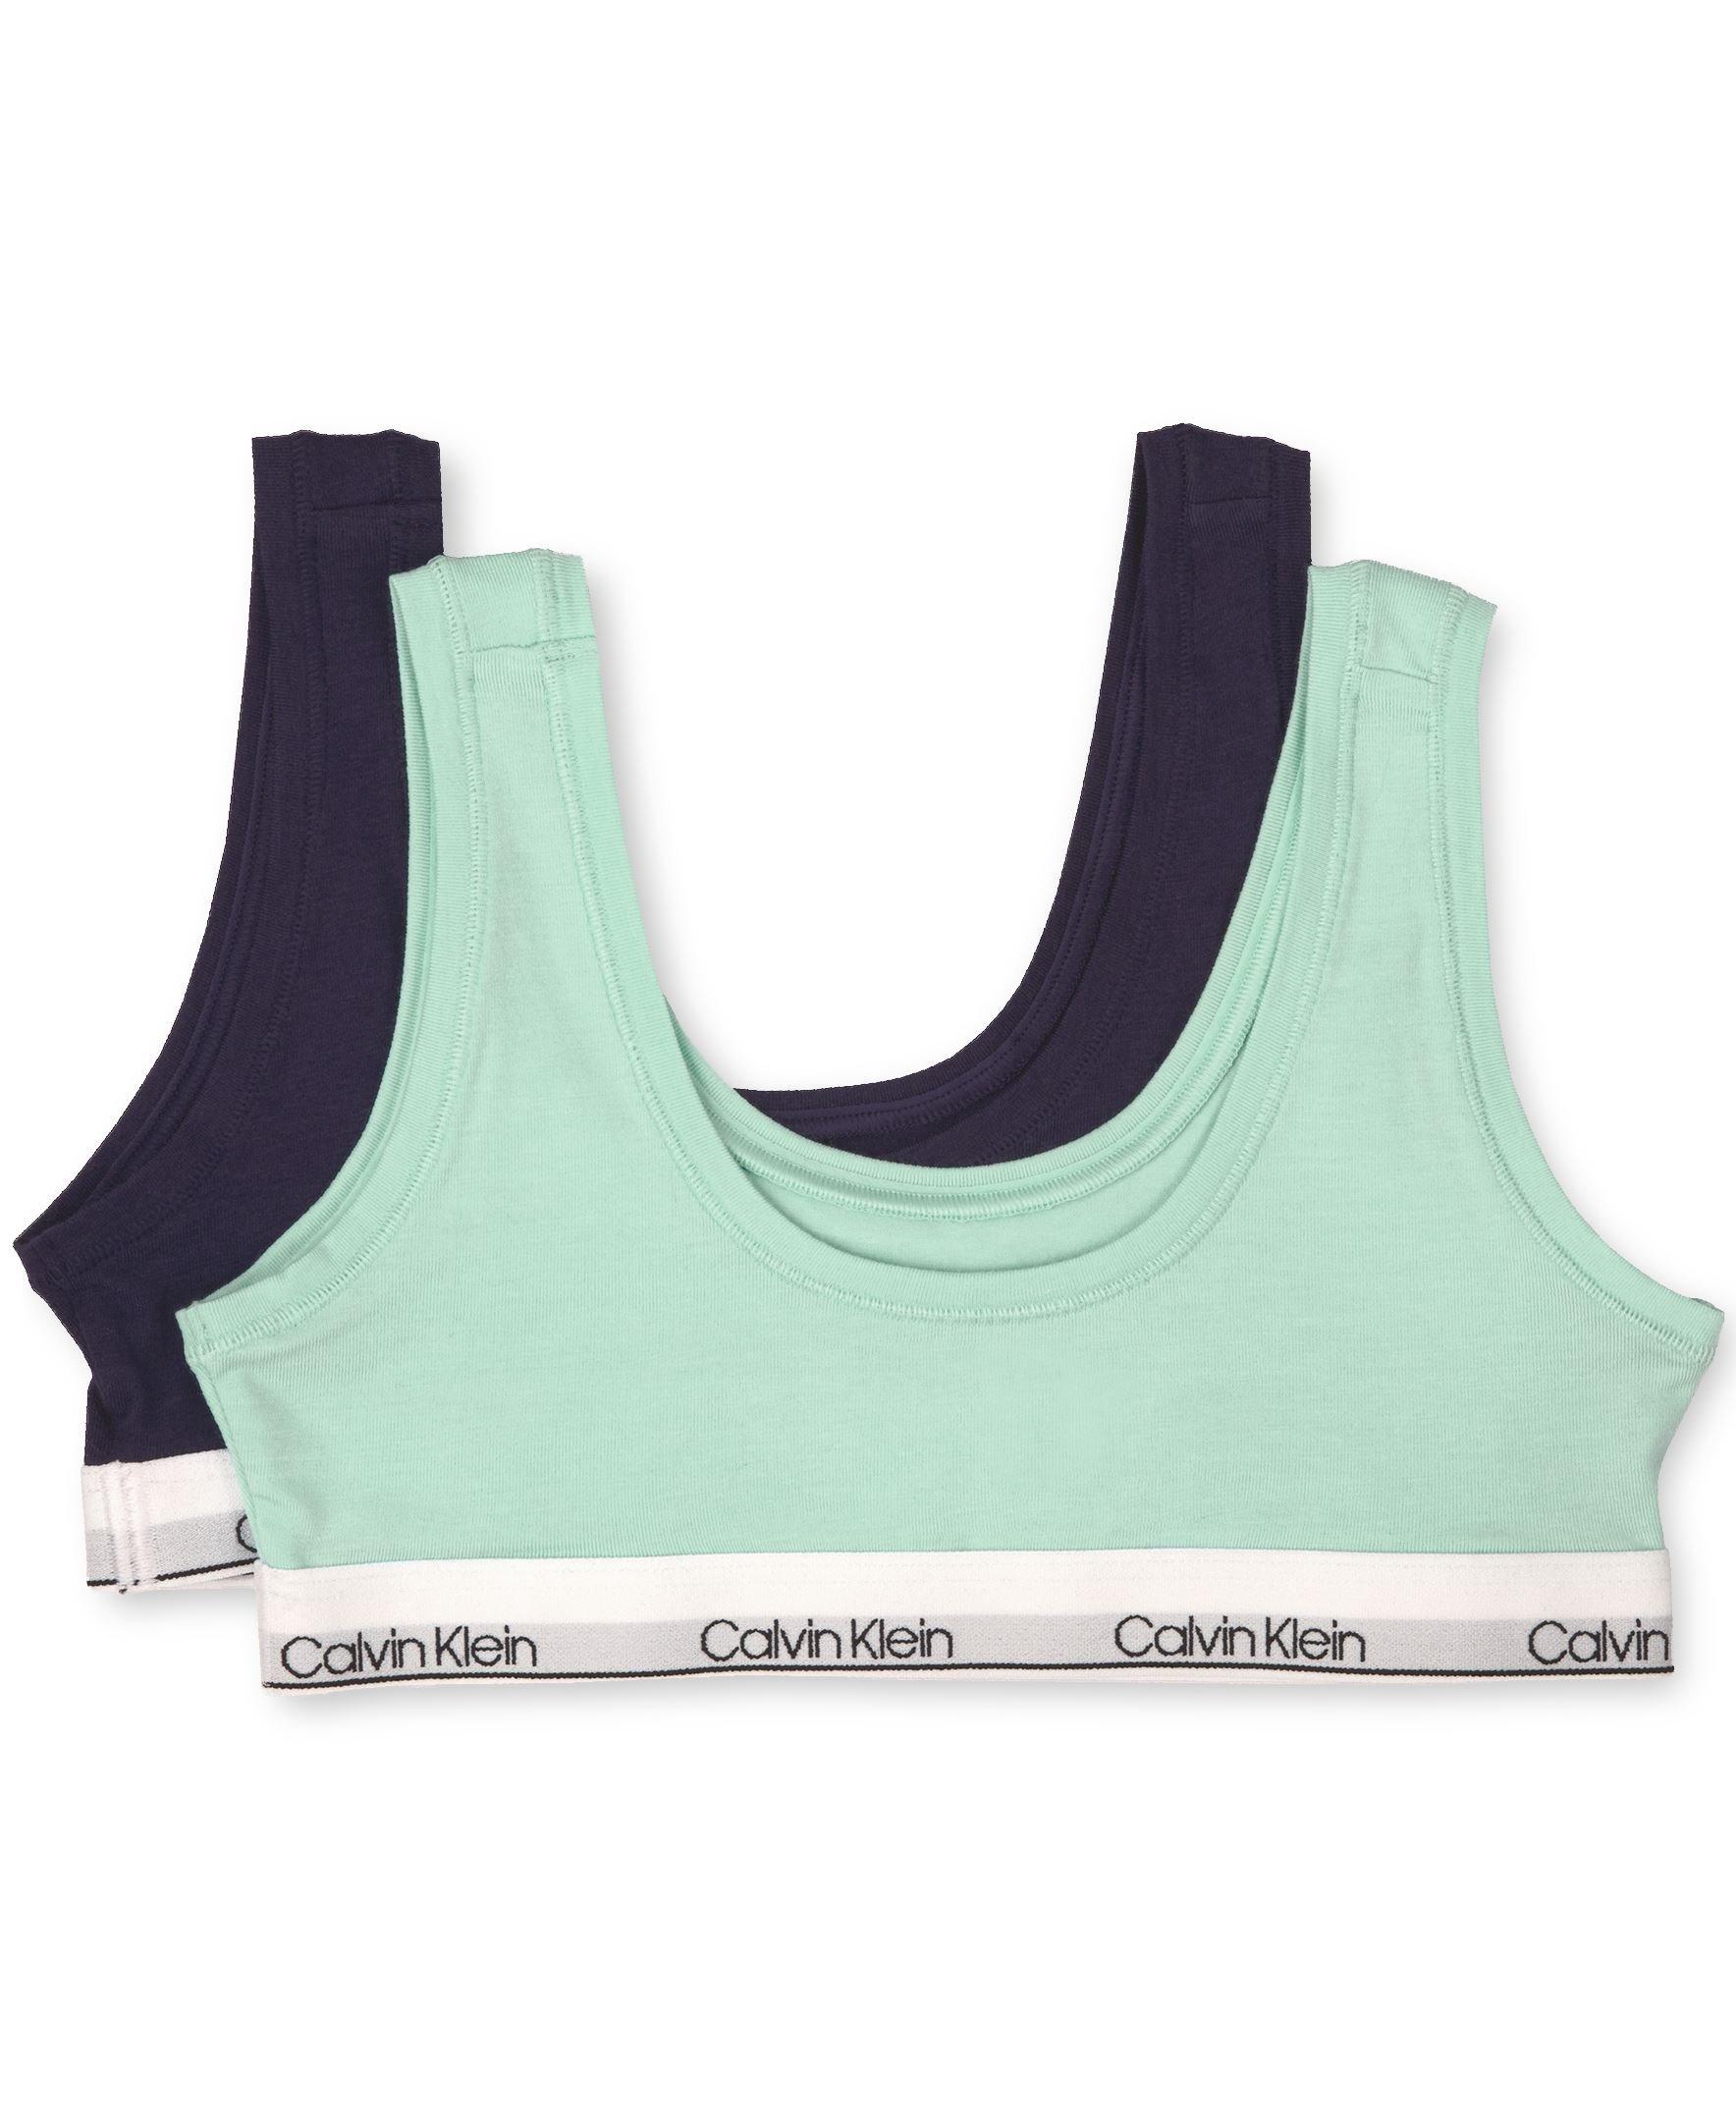 Calvin Klein Big Girls' Modern Cotton Bralette, 2 Pack - Teal, Symphony by Calvin Klein